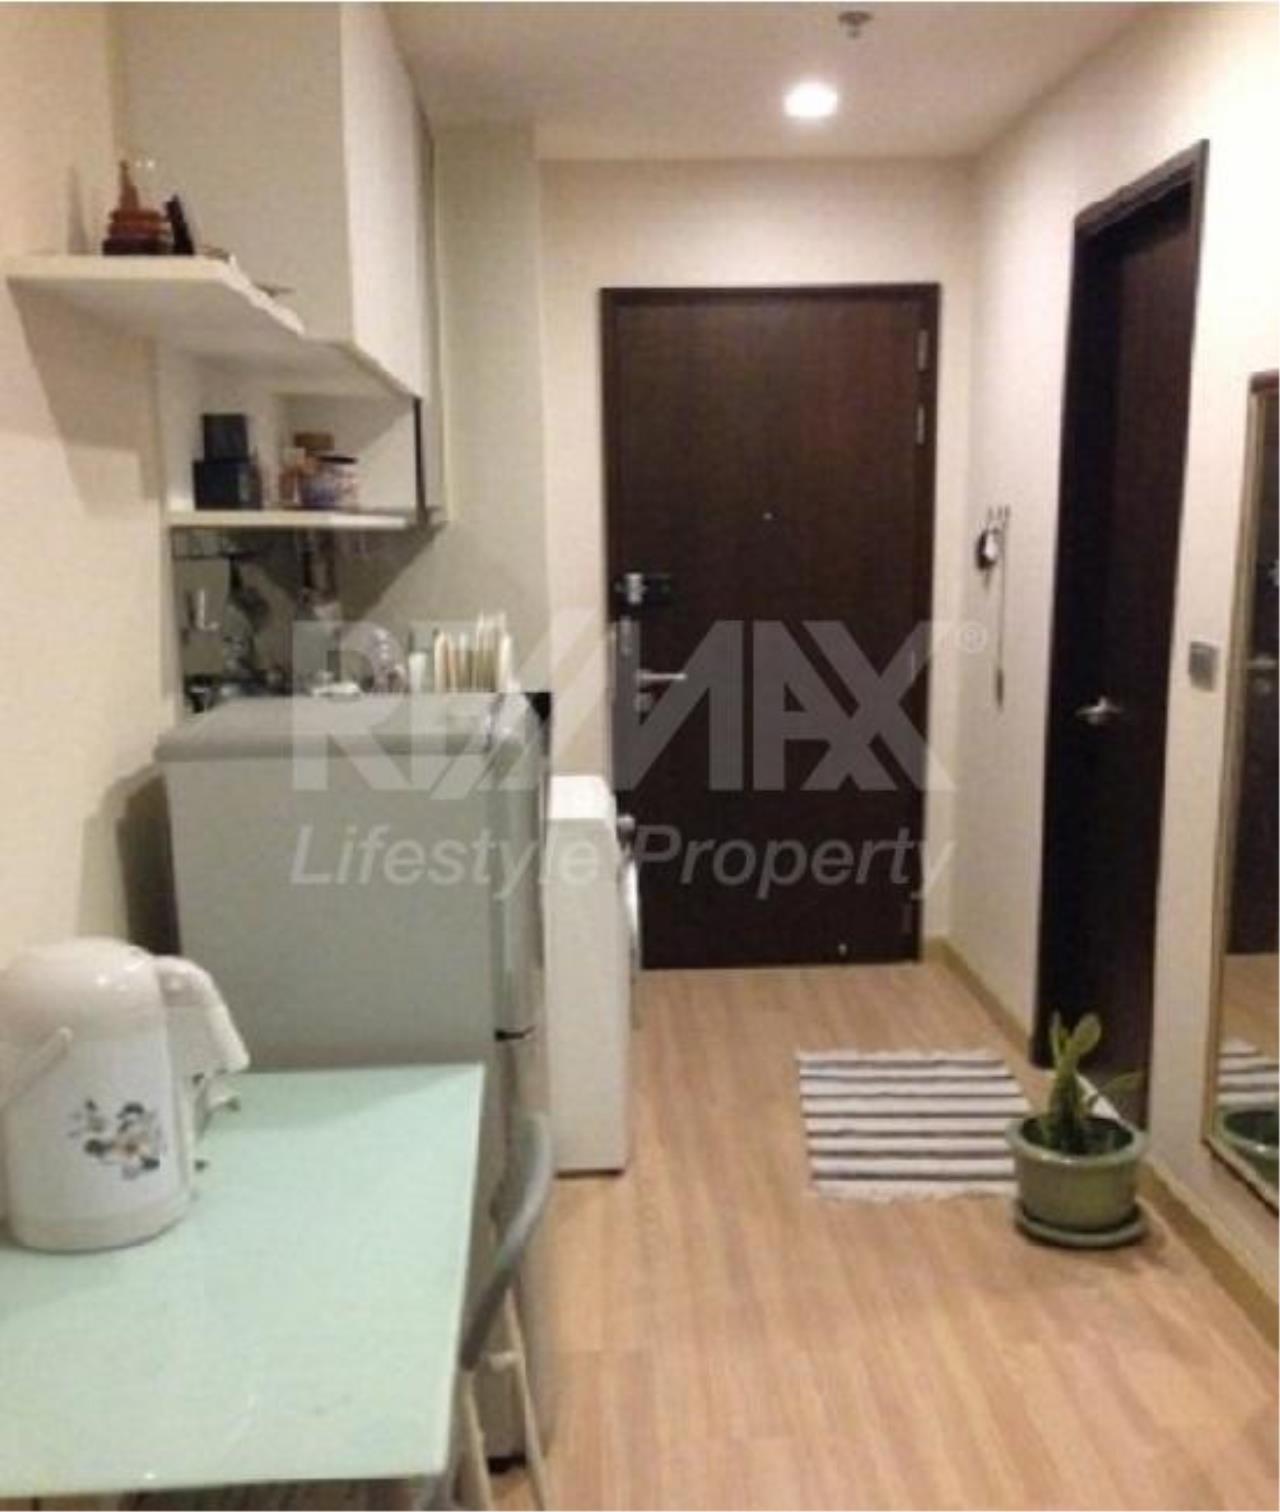 RE/MAX LifeStyle Property Agency's Sky Walk Condominium 2